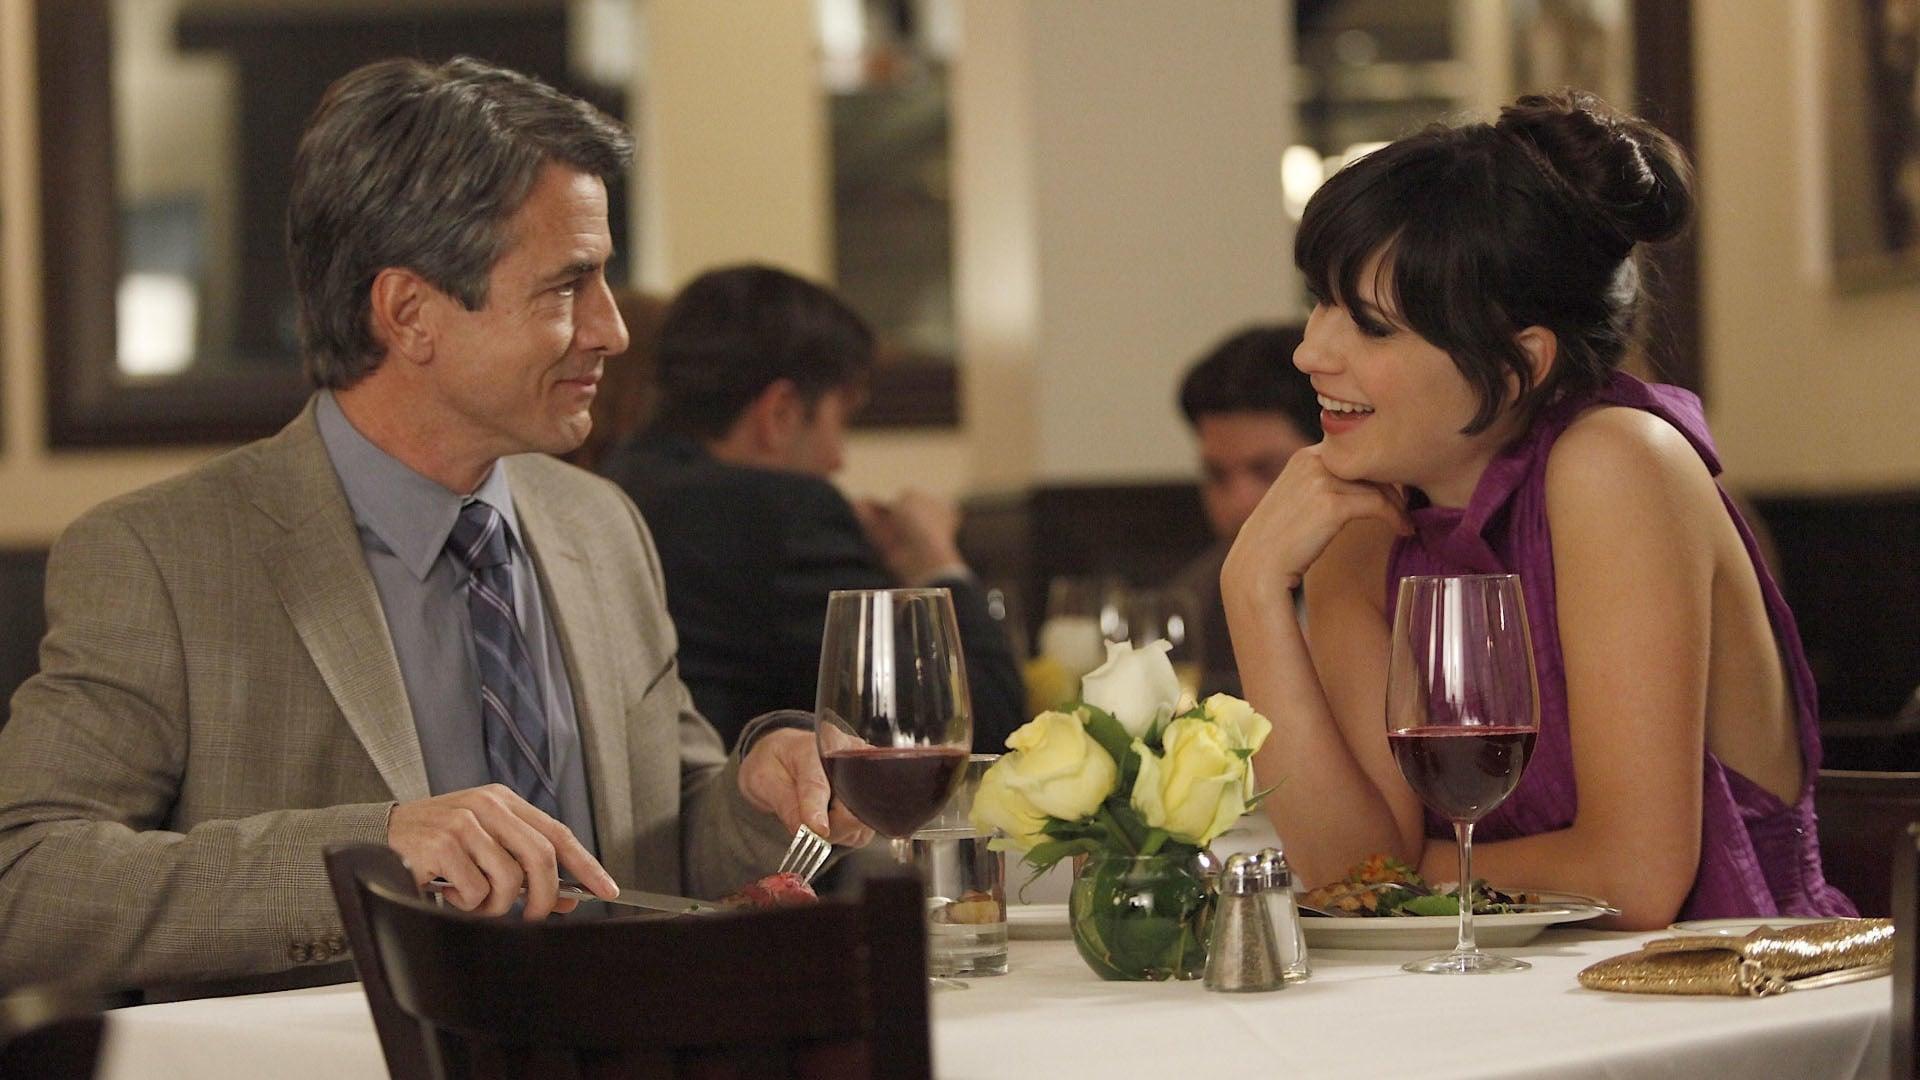 The new girl episode where schmidts dating 2 women